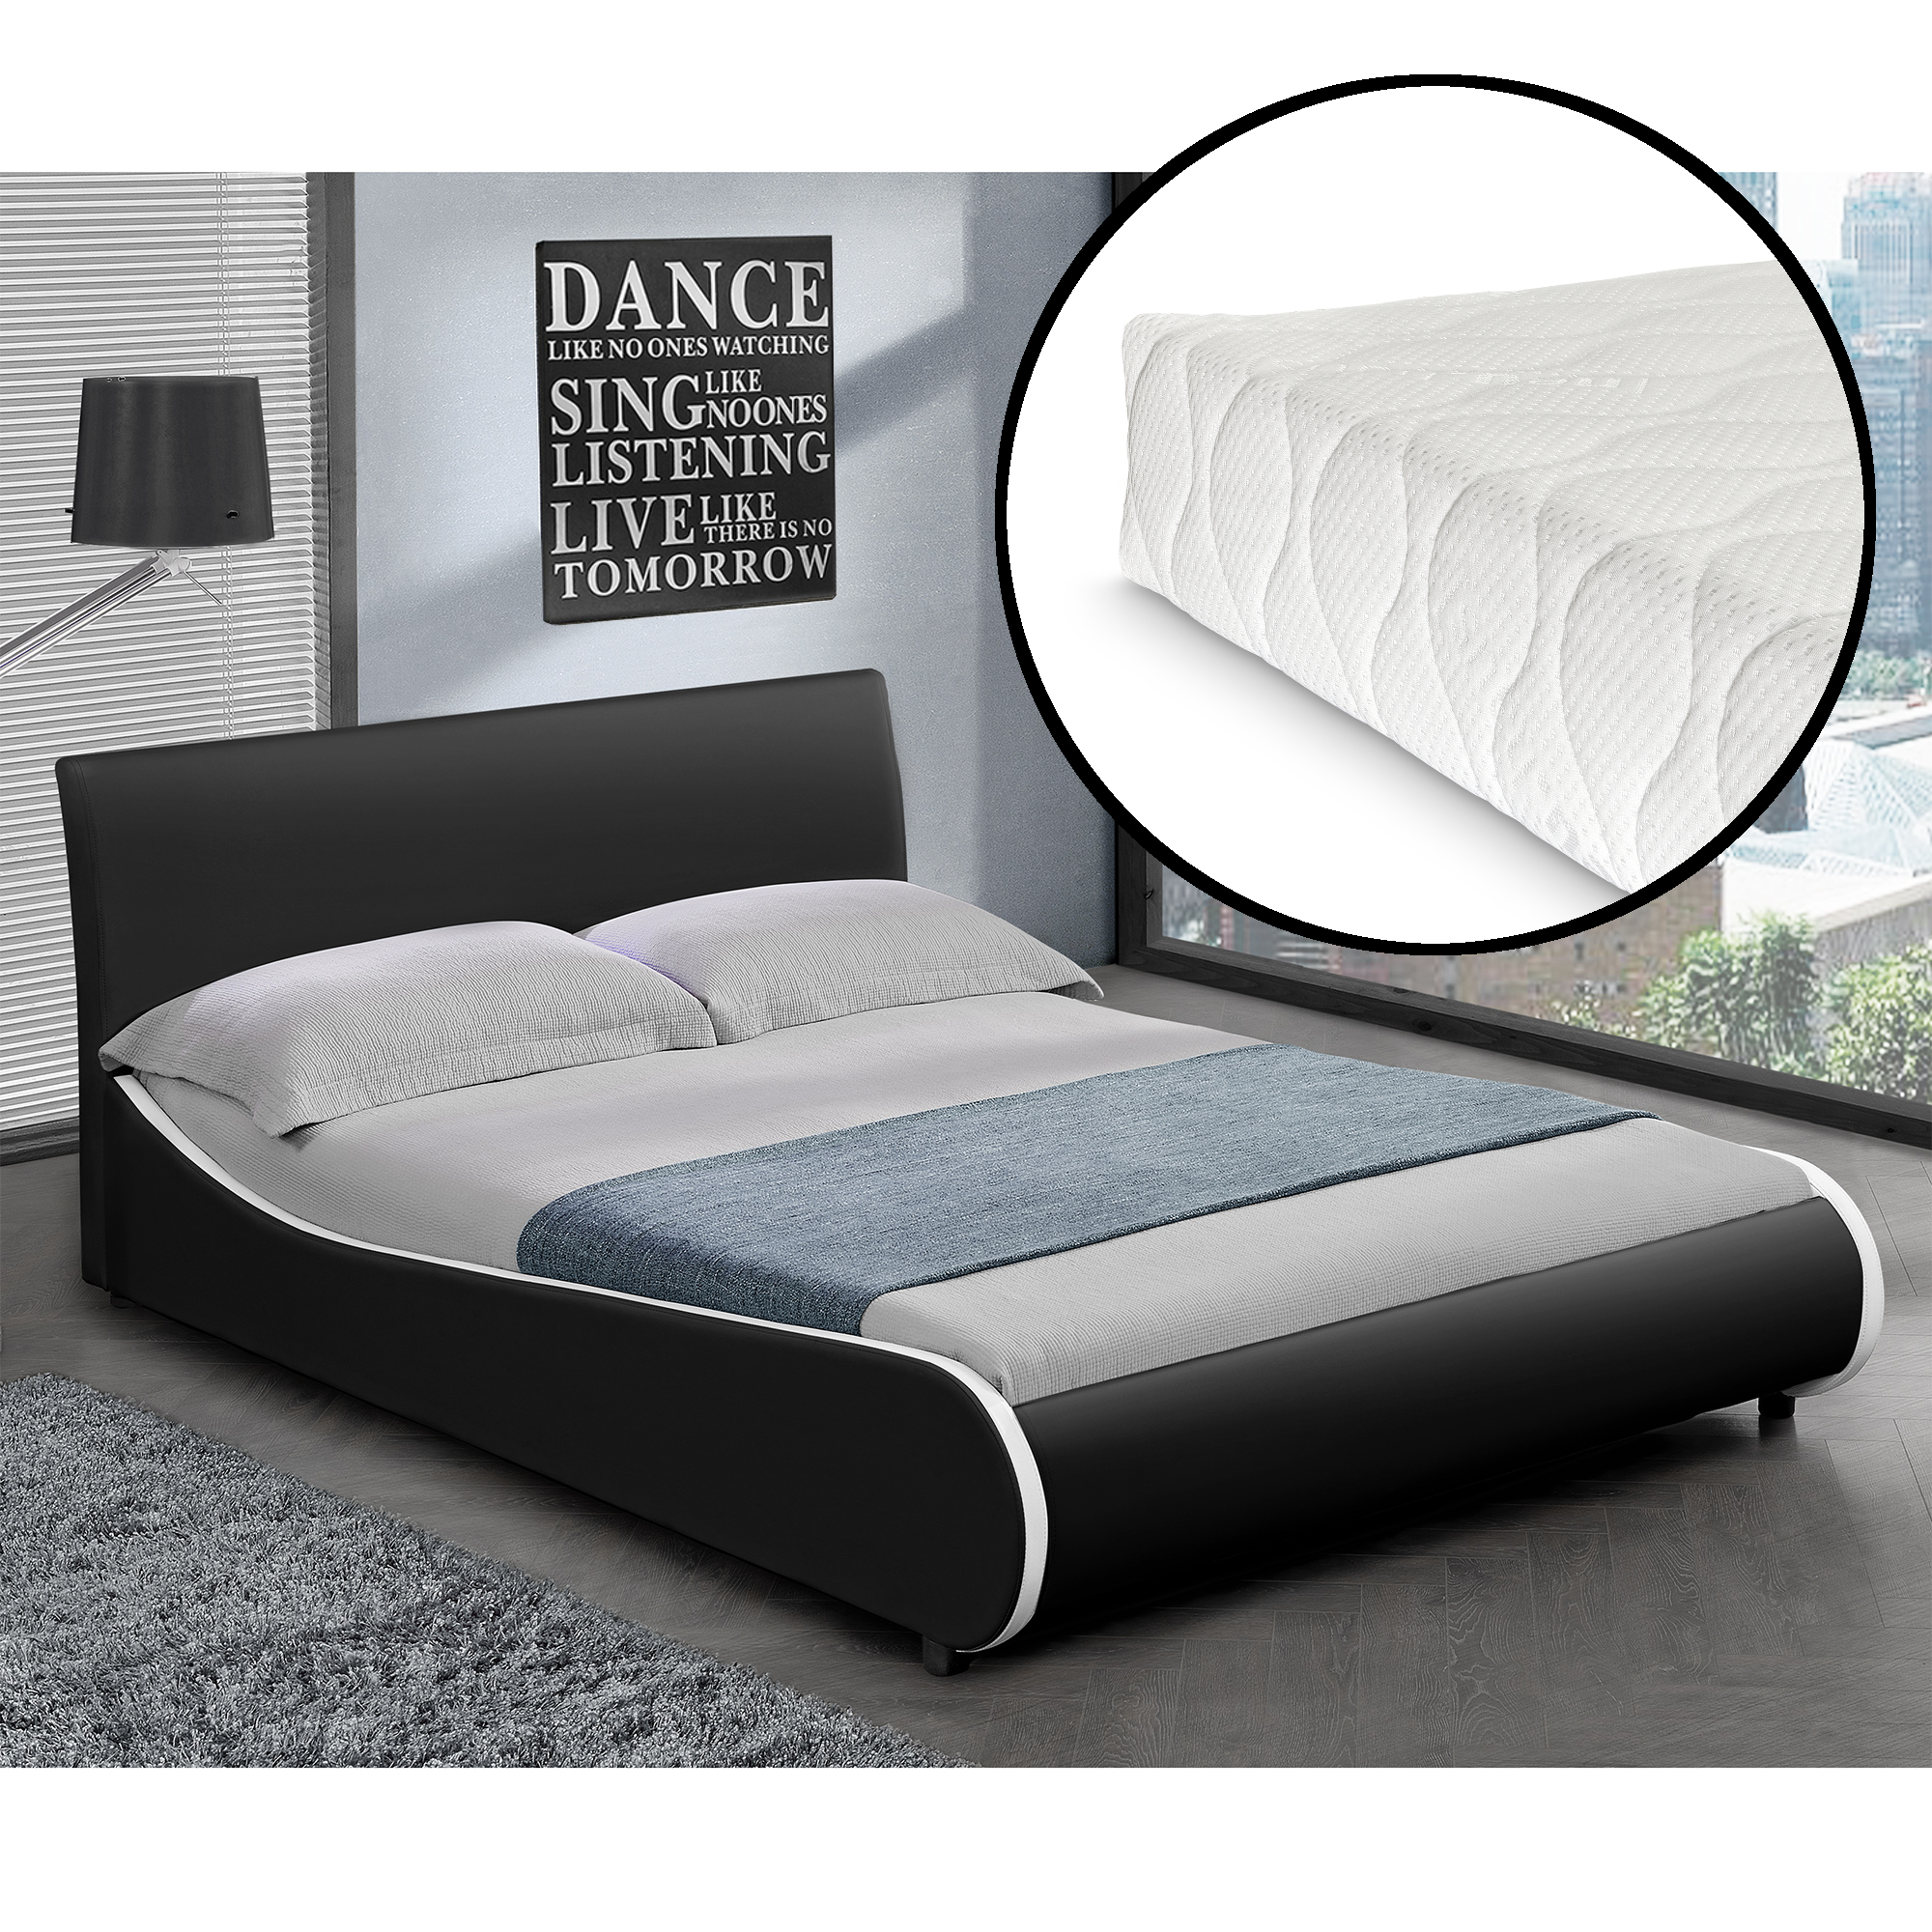 corium polsterbett matratze 140x200cm kunst leder. Black Bedroom Furniture Sets. Home Design Ideas